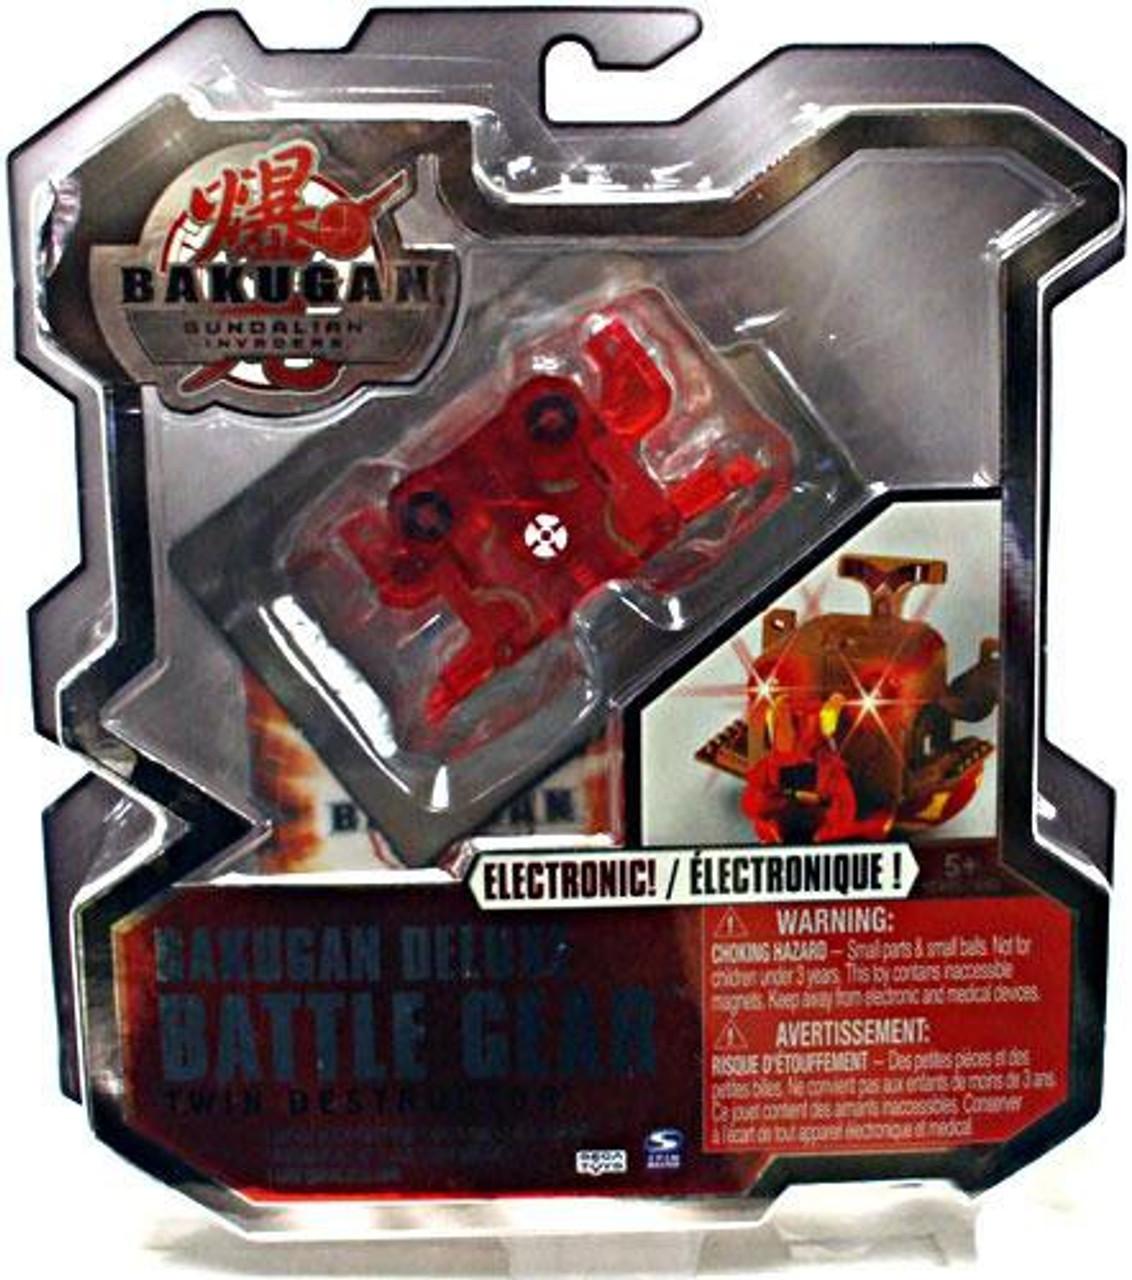 Bakugan Gundalian Invaders Deluxe Electronic Battle Gear Pyrus Twin Destructor [Red]